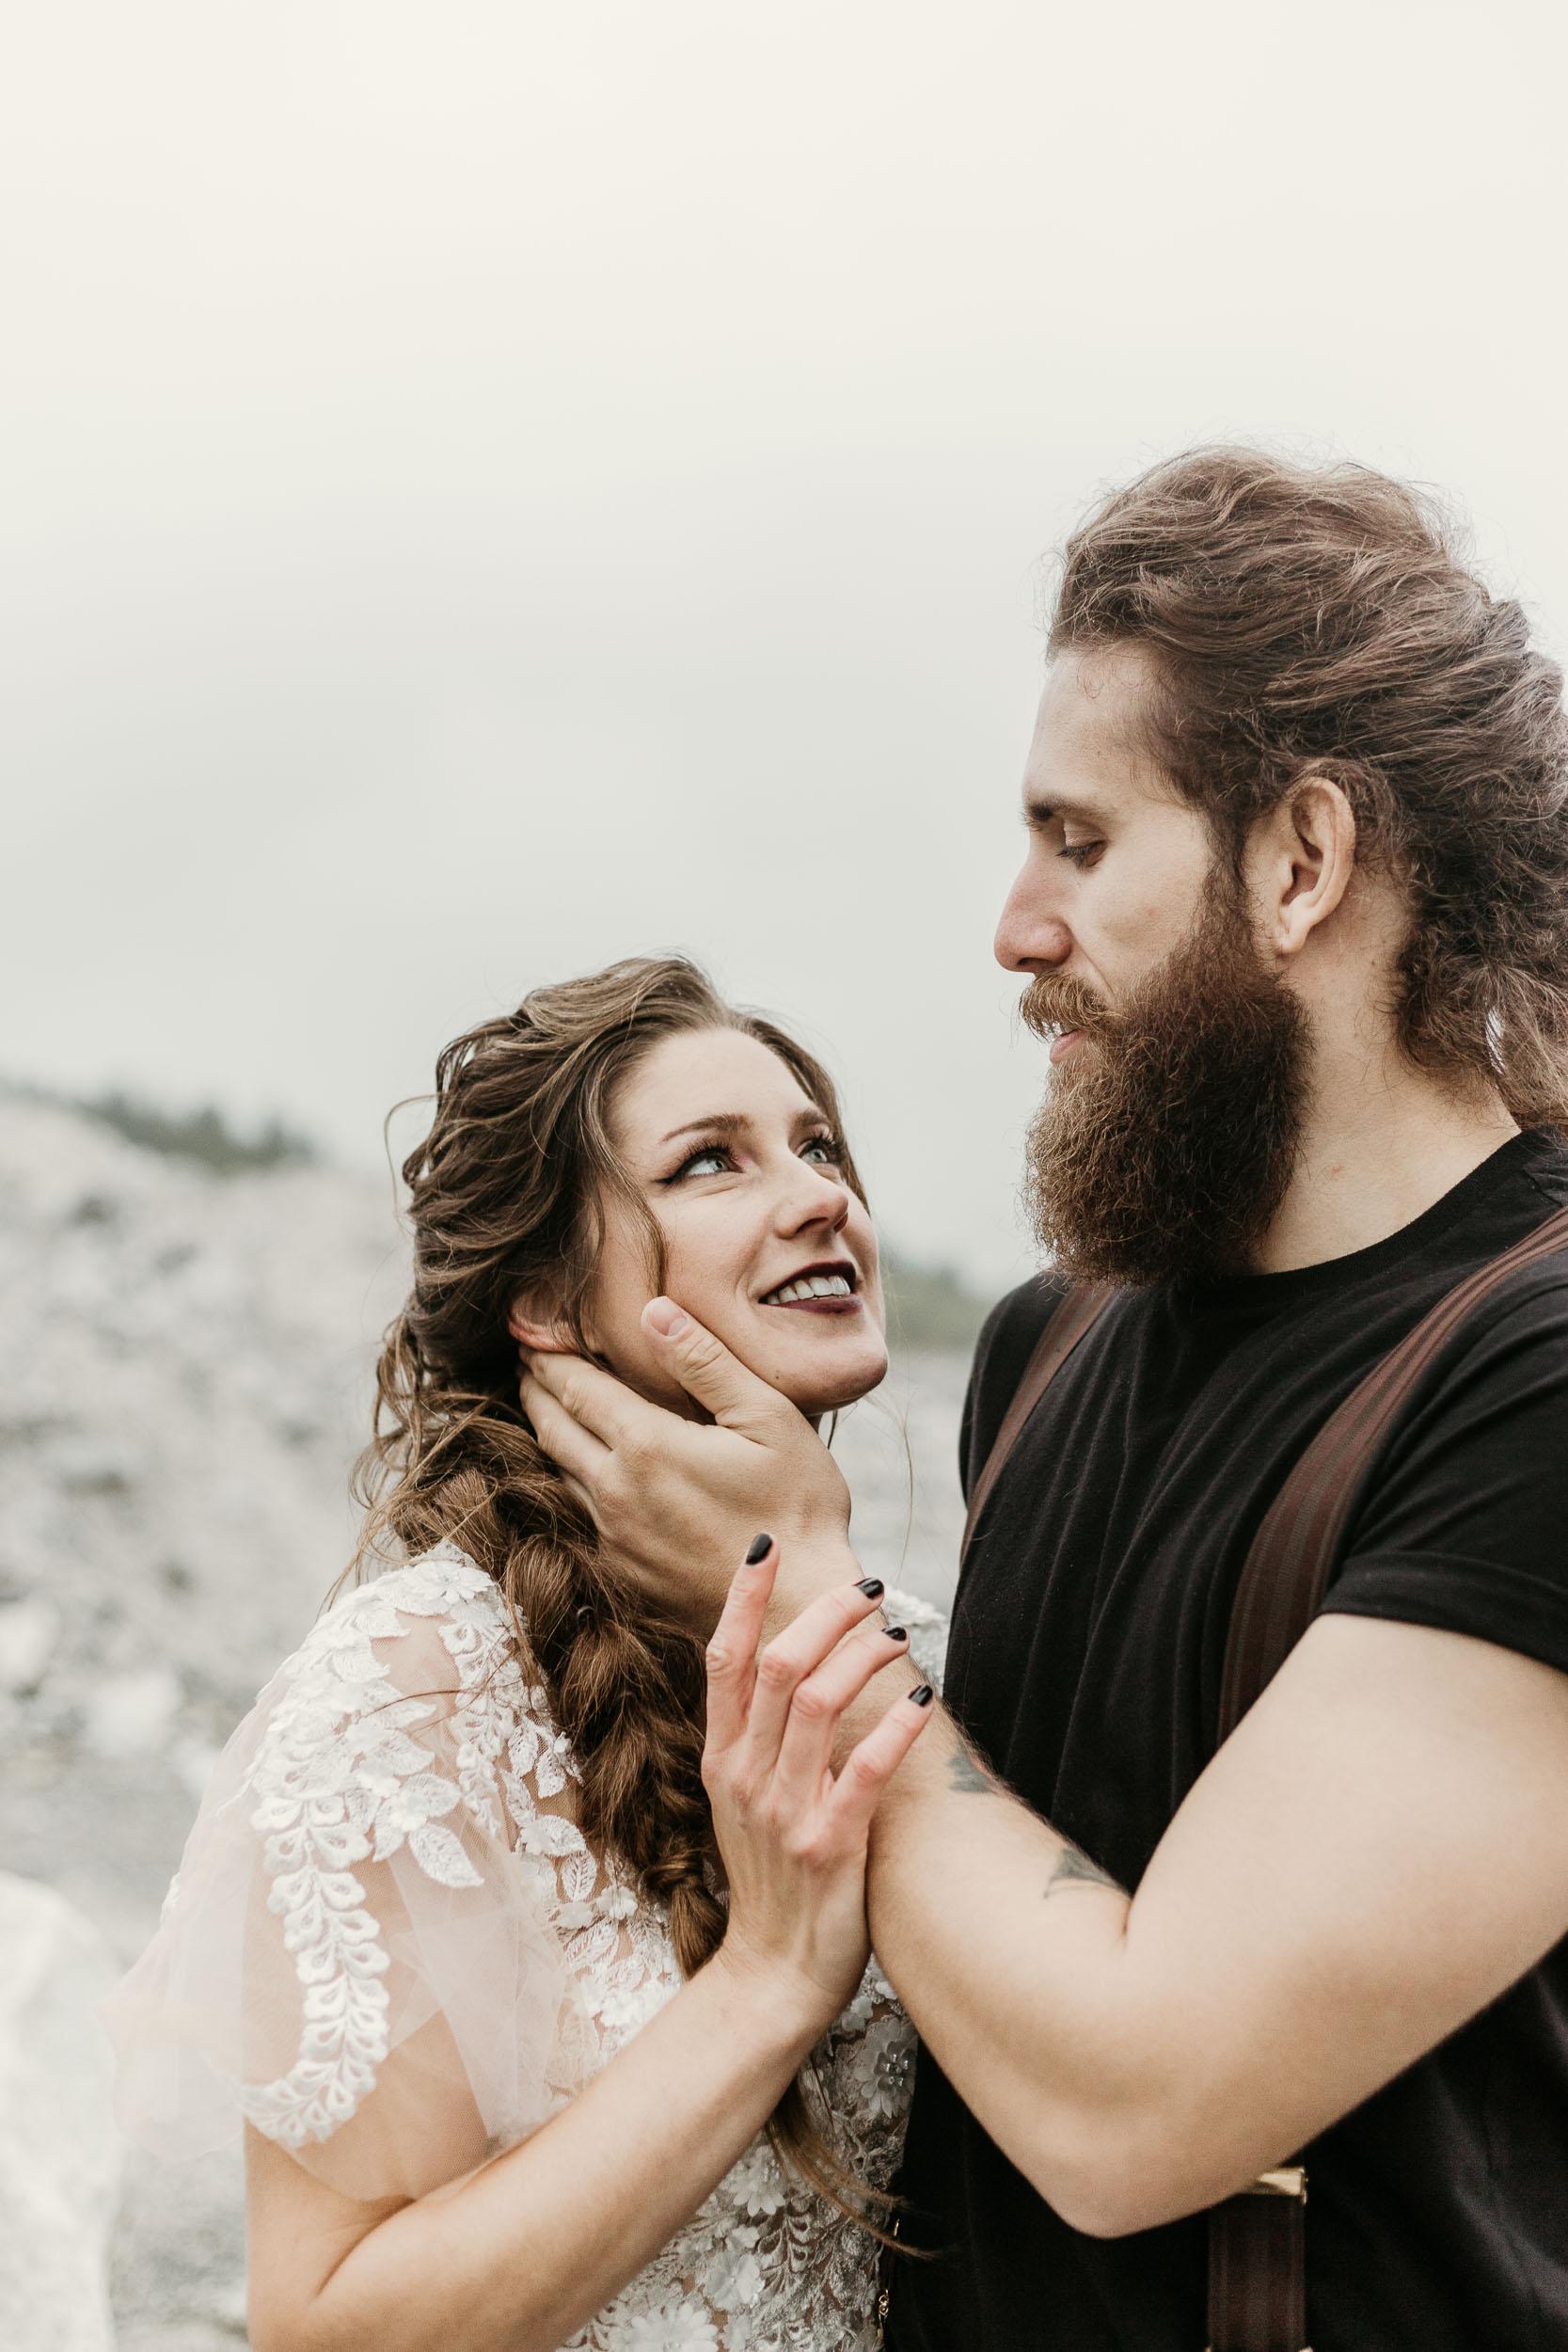 intimate-wedding-elopement-photographer-ottawa-toronto-1108.jpg